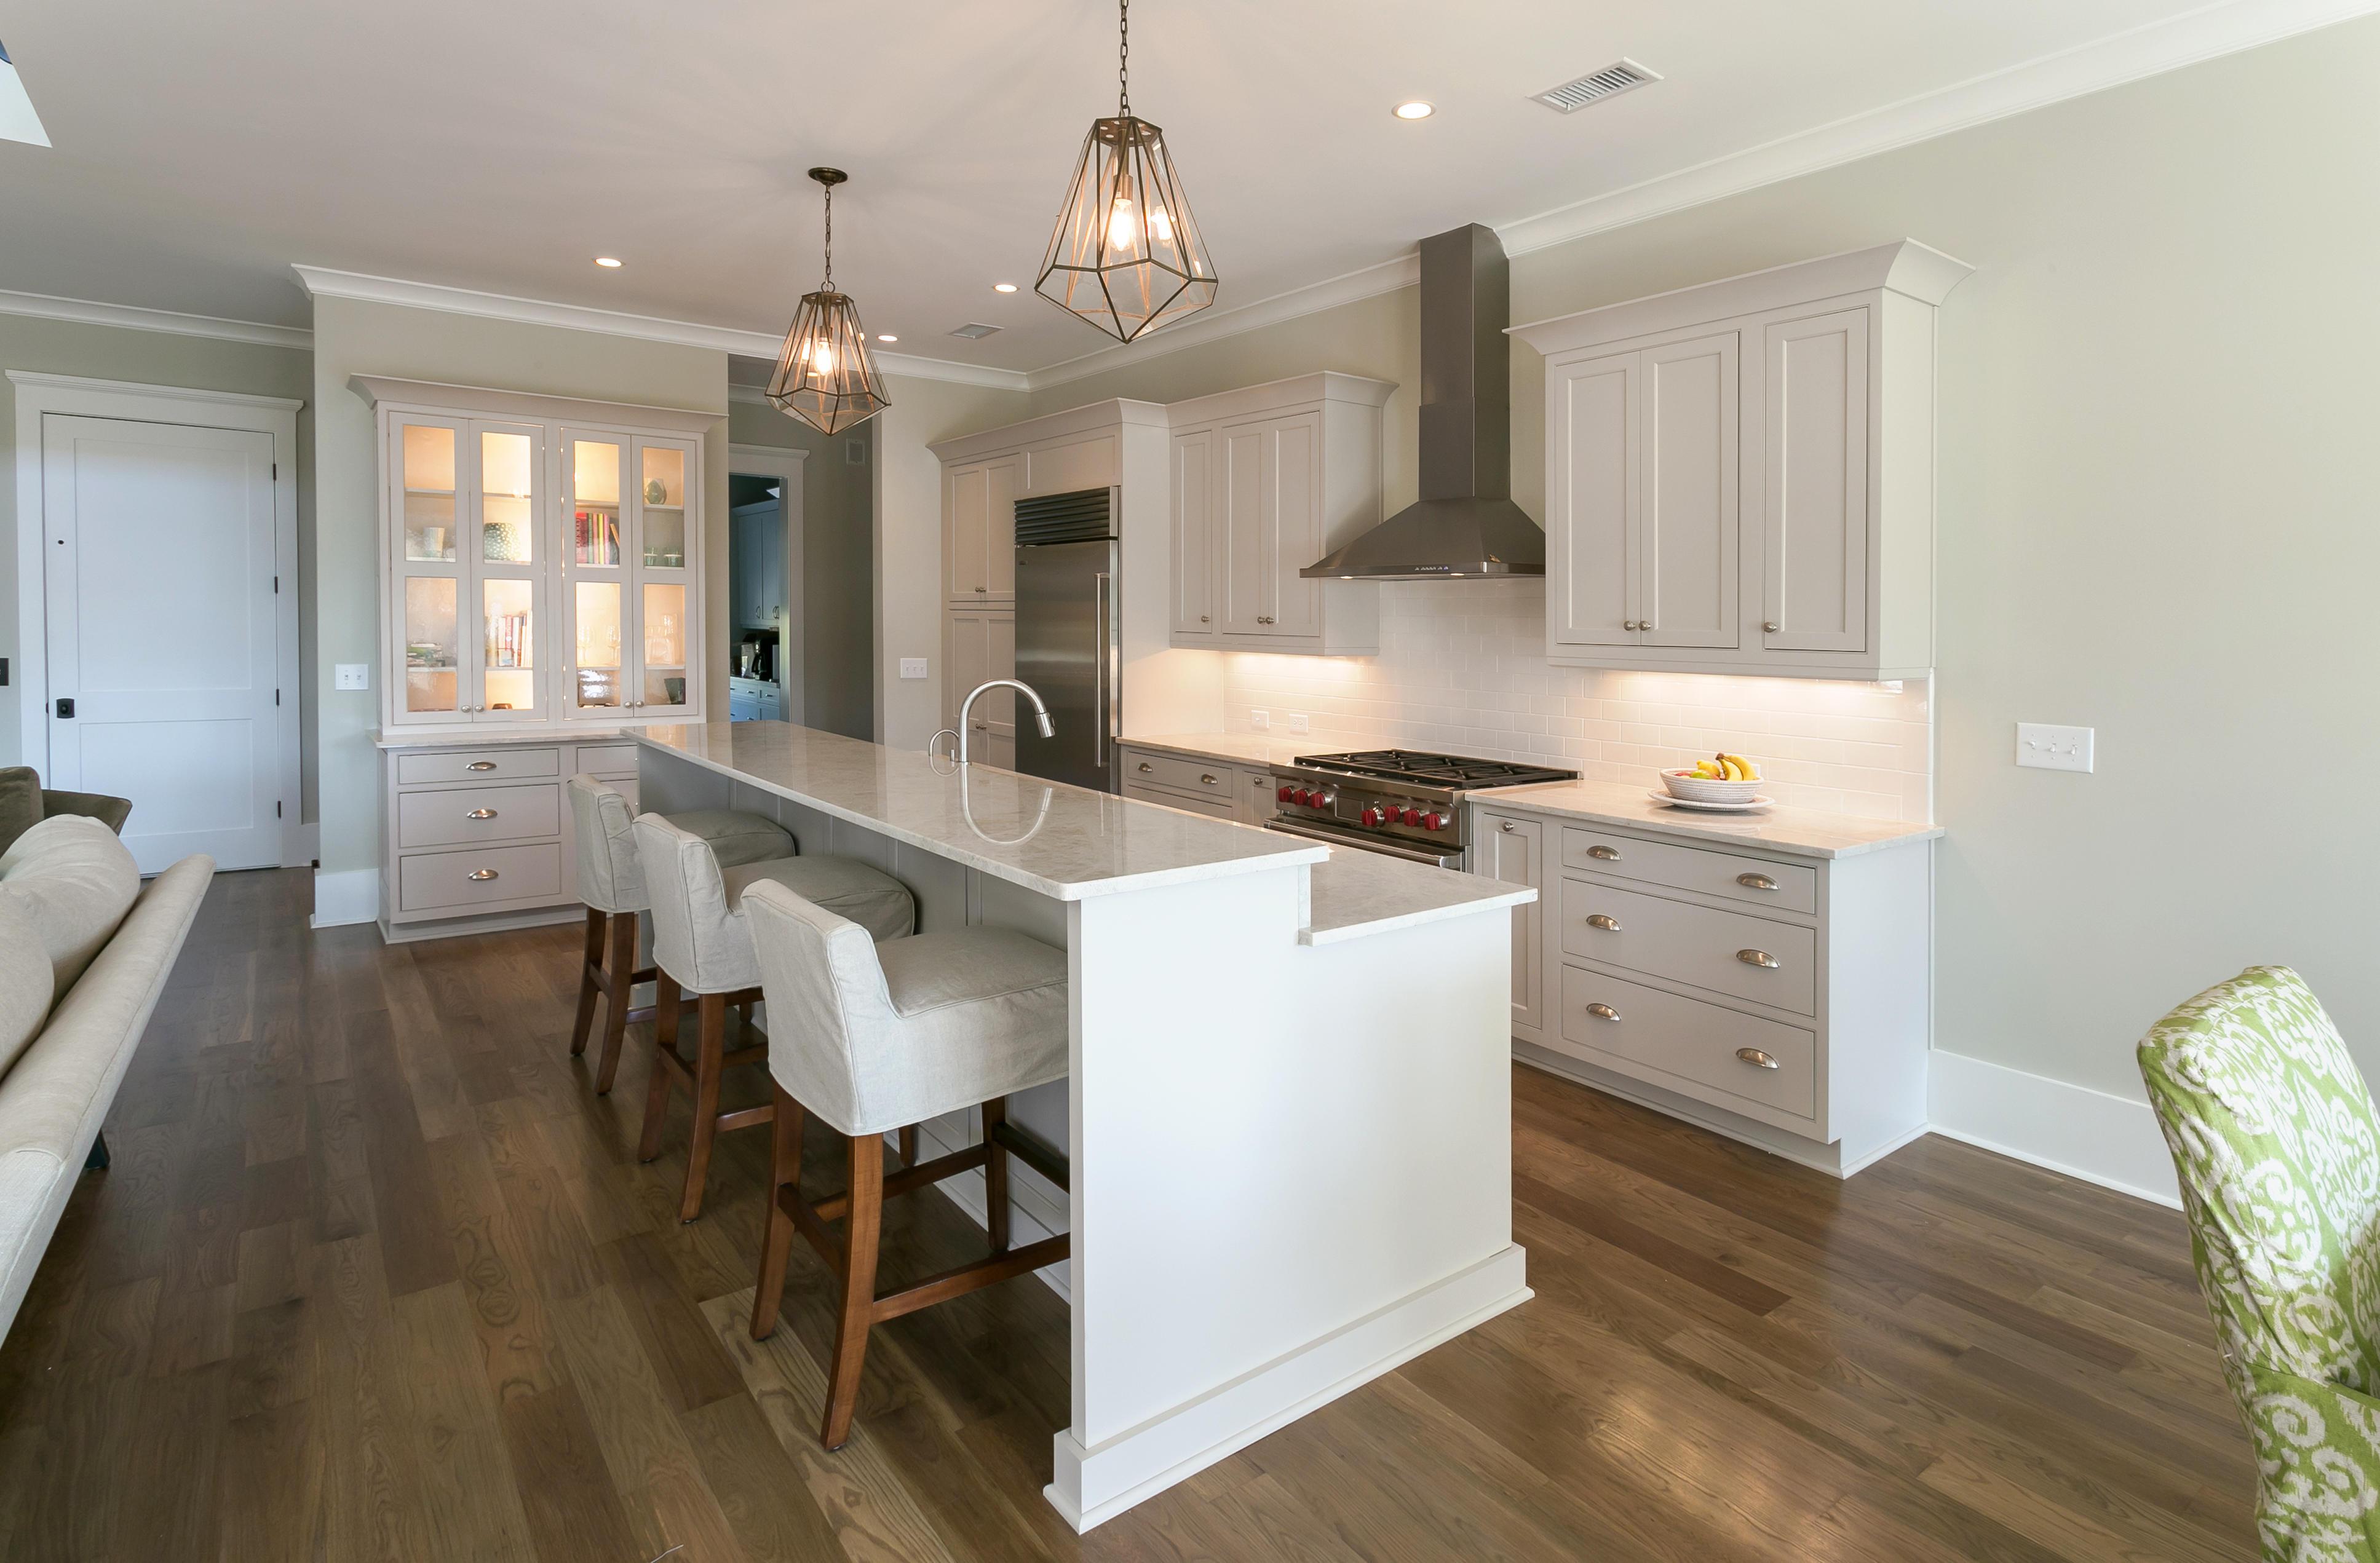 Southeast Kitchens image 1